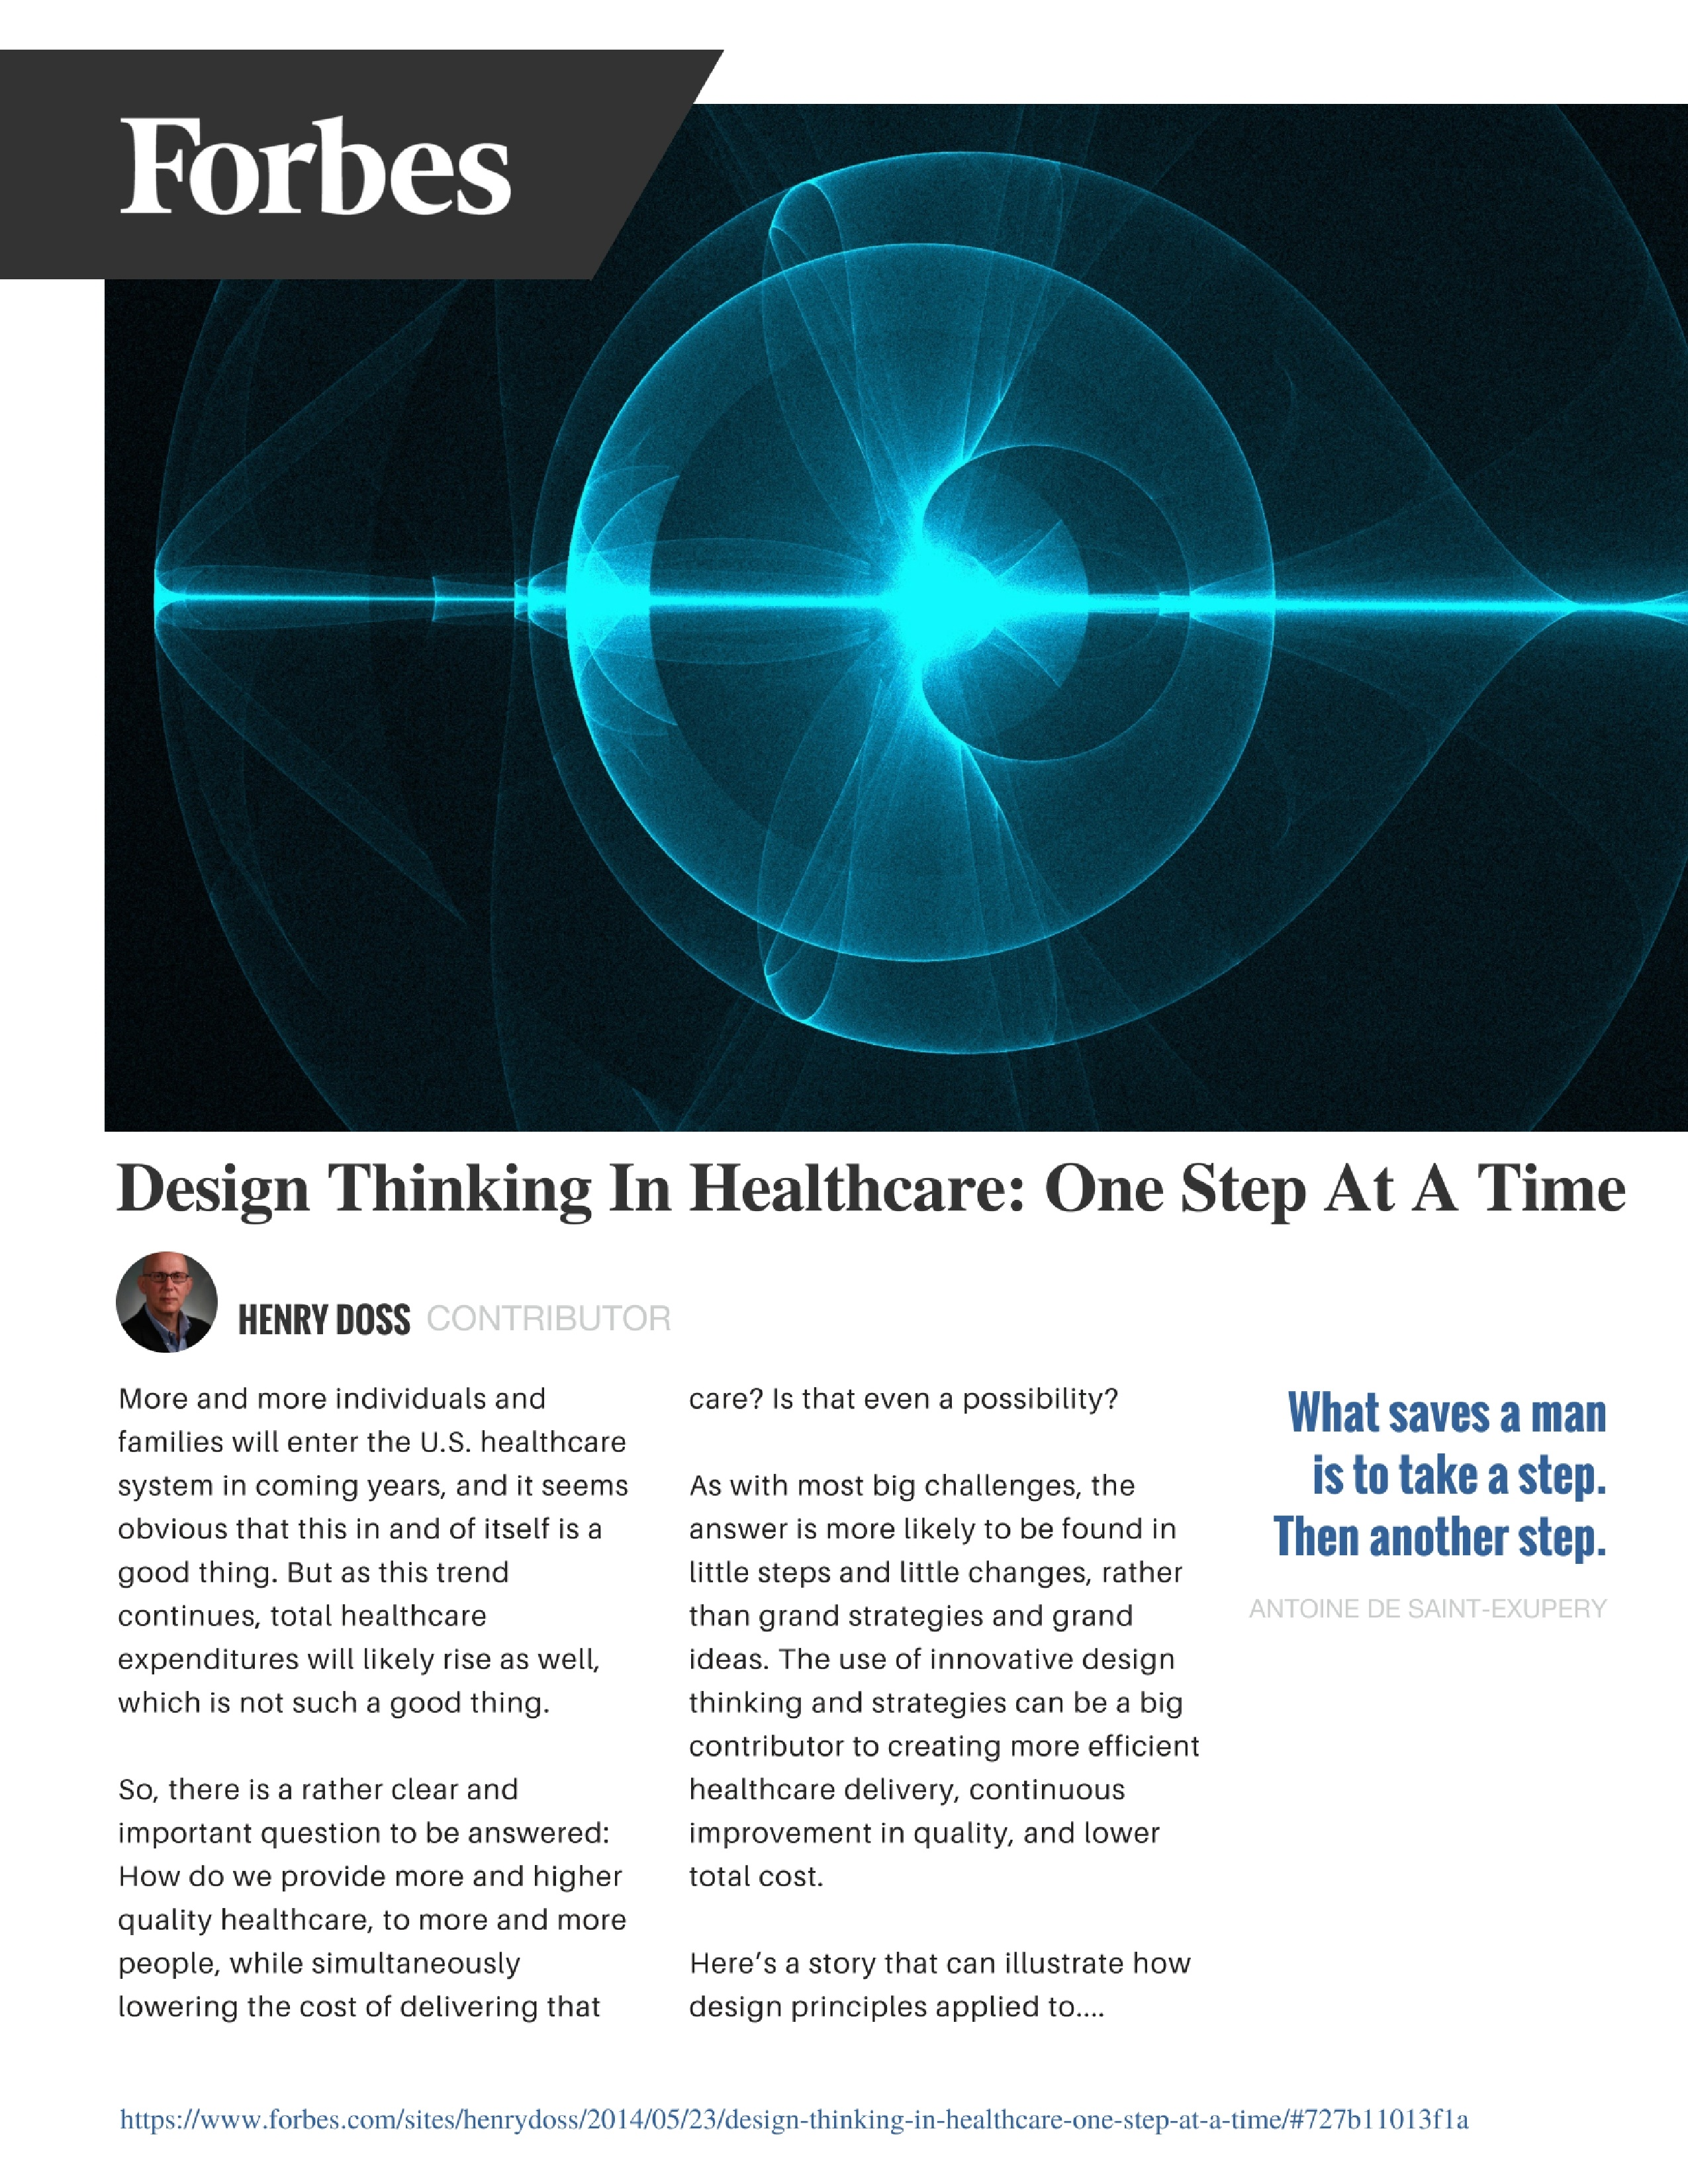 design thinking in healthcare.jpg